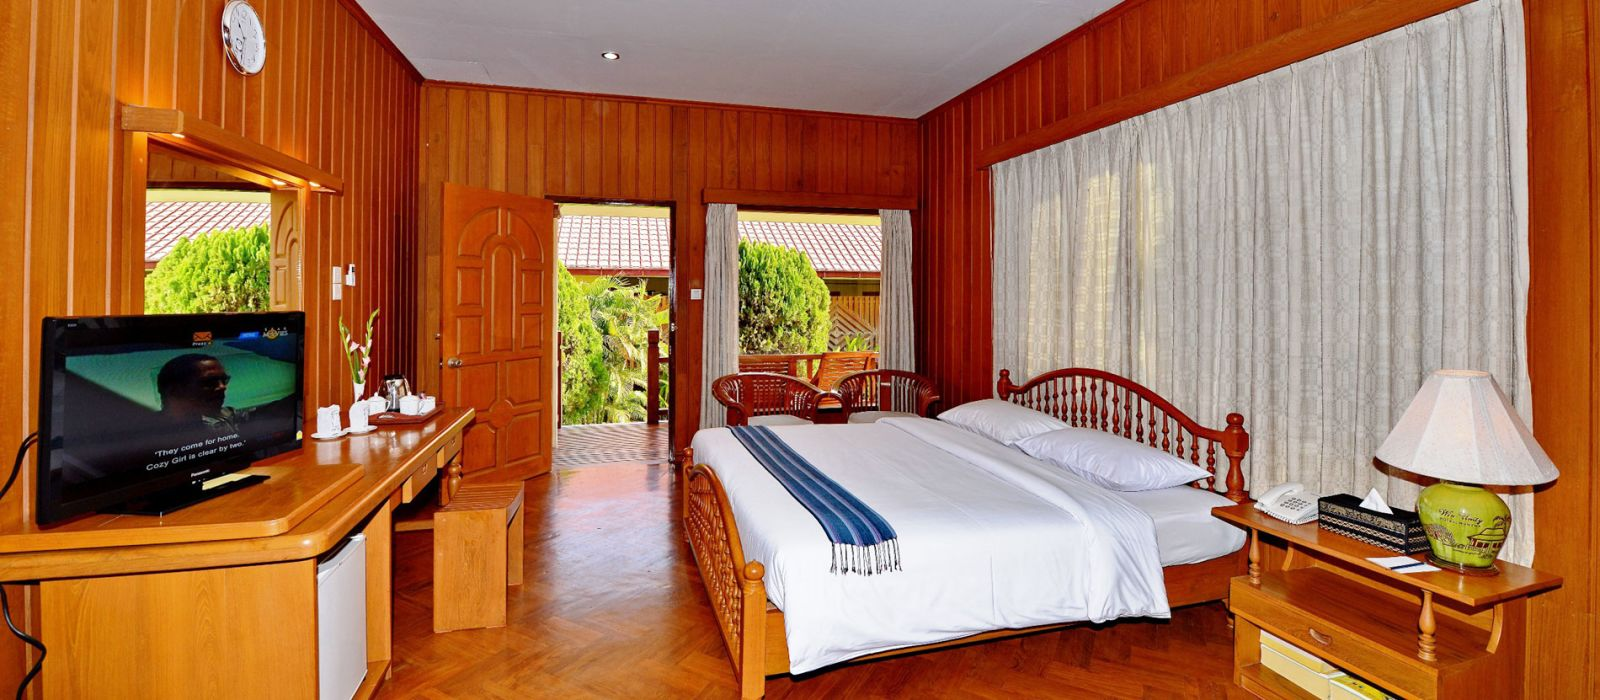 Hotel Win Unity (Monywa) Myanmar